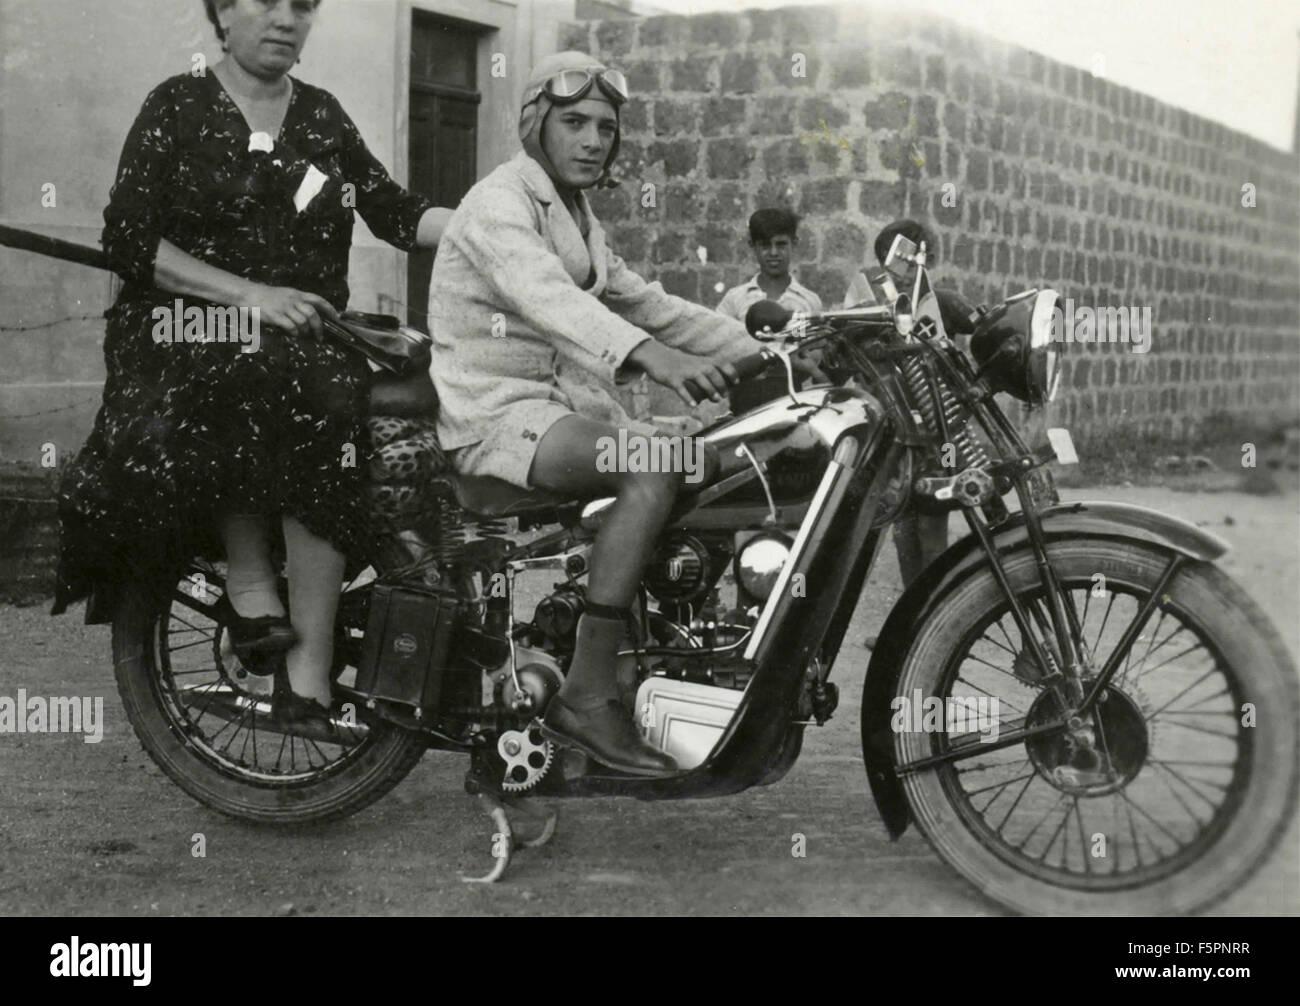 Boy with a woman on Moto Guzzi motorbike, Italy - Stock Image